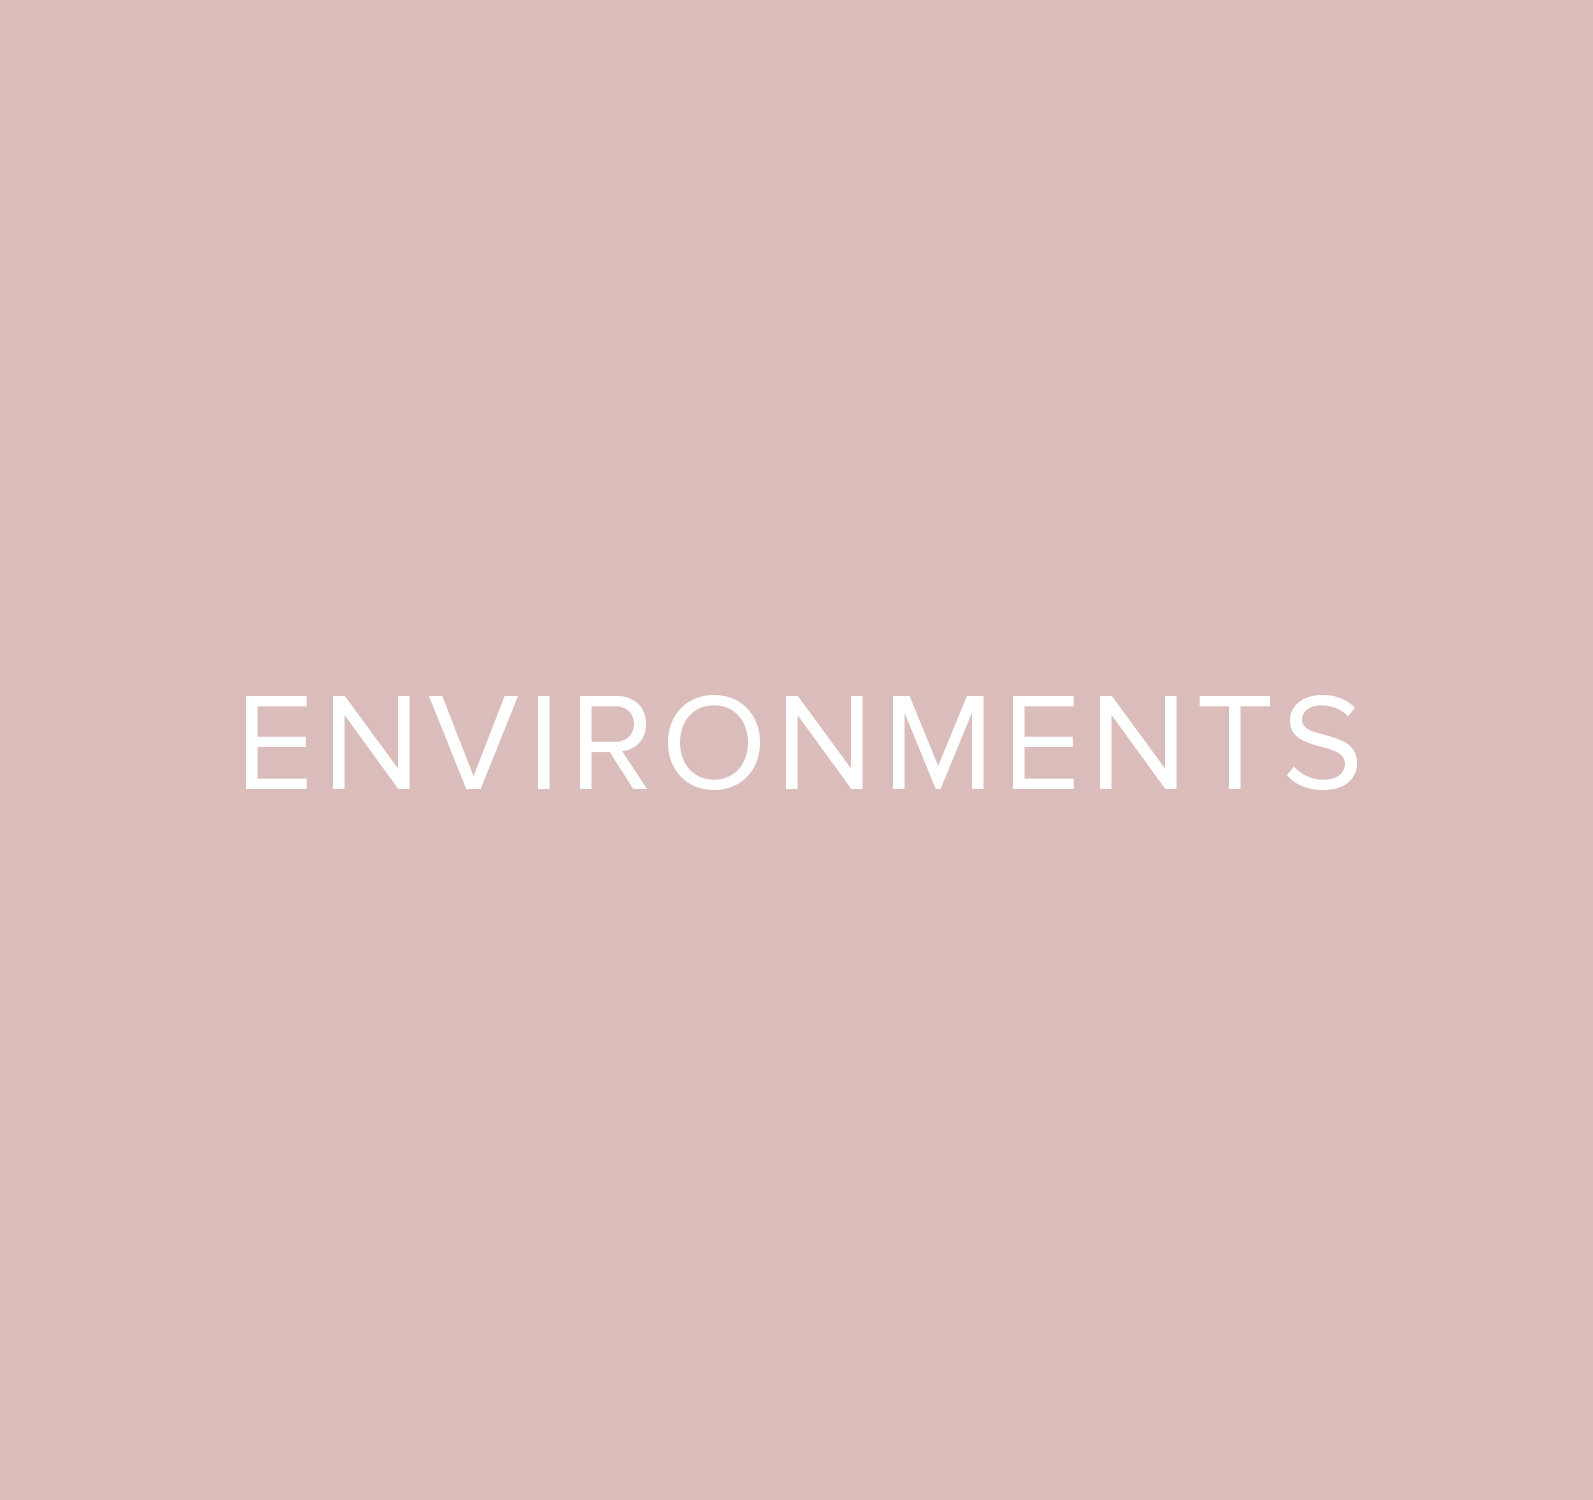 environments.jpg